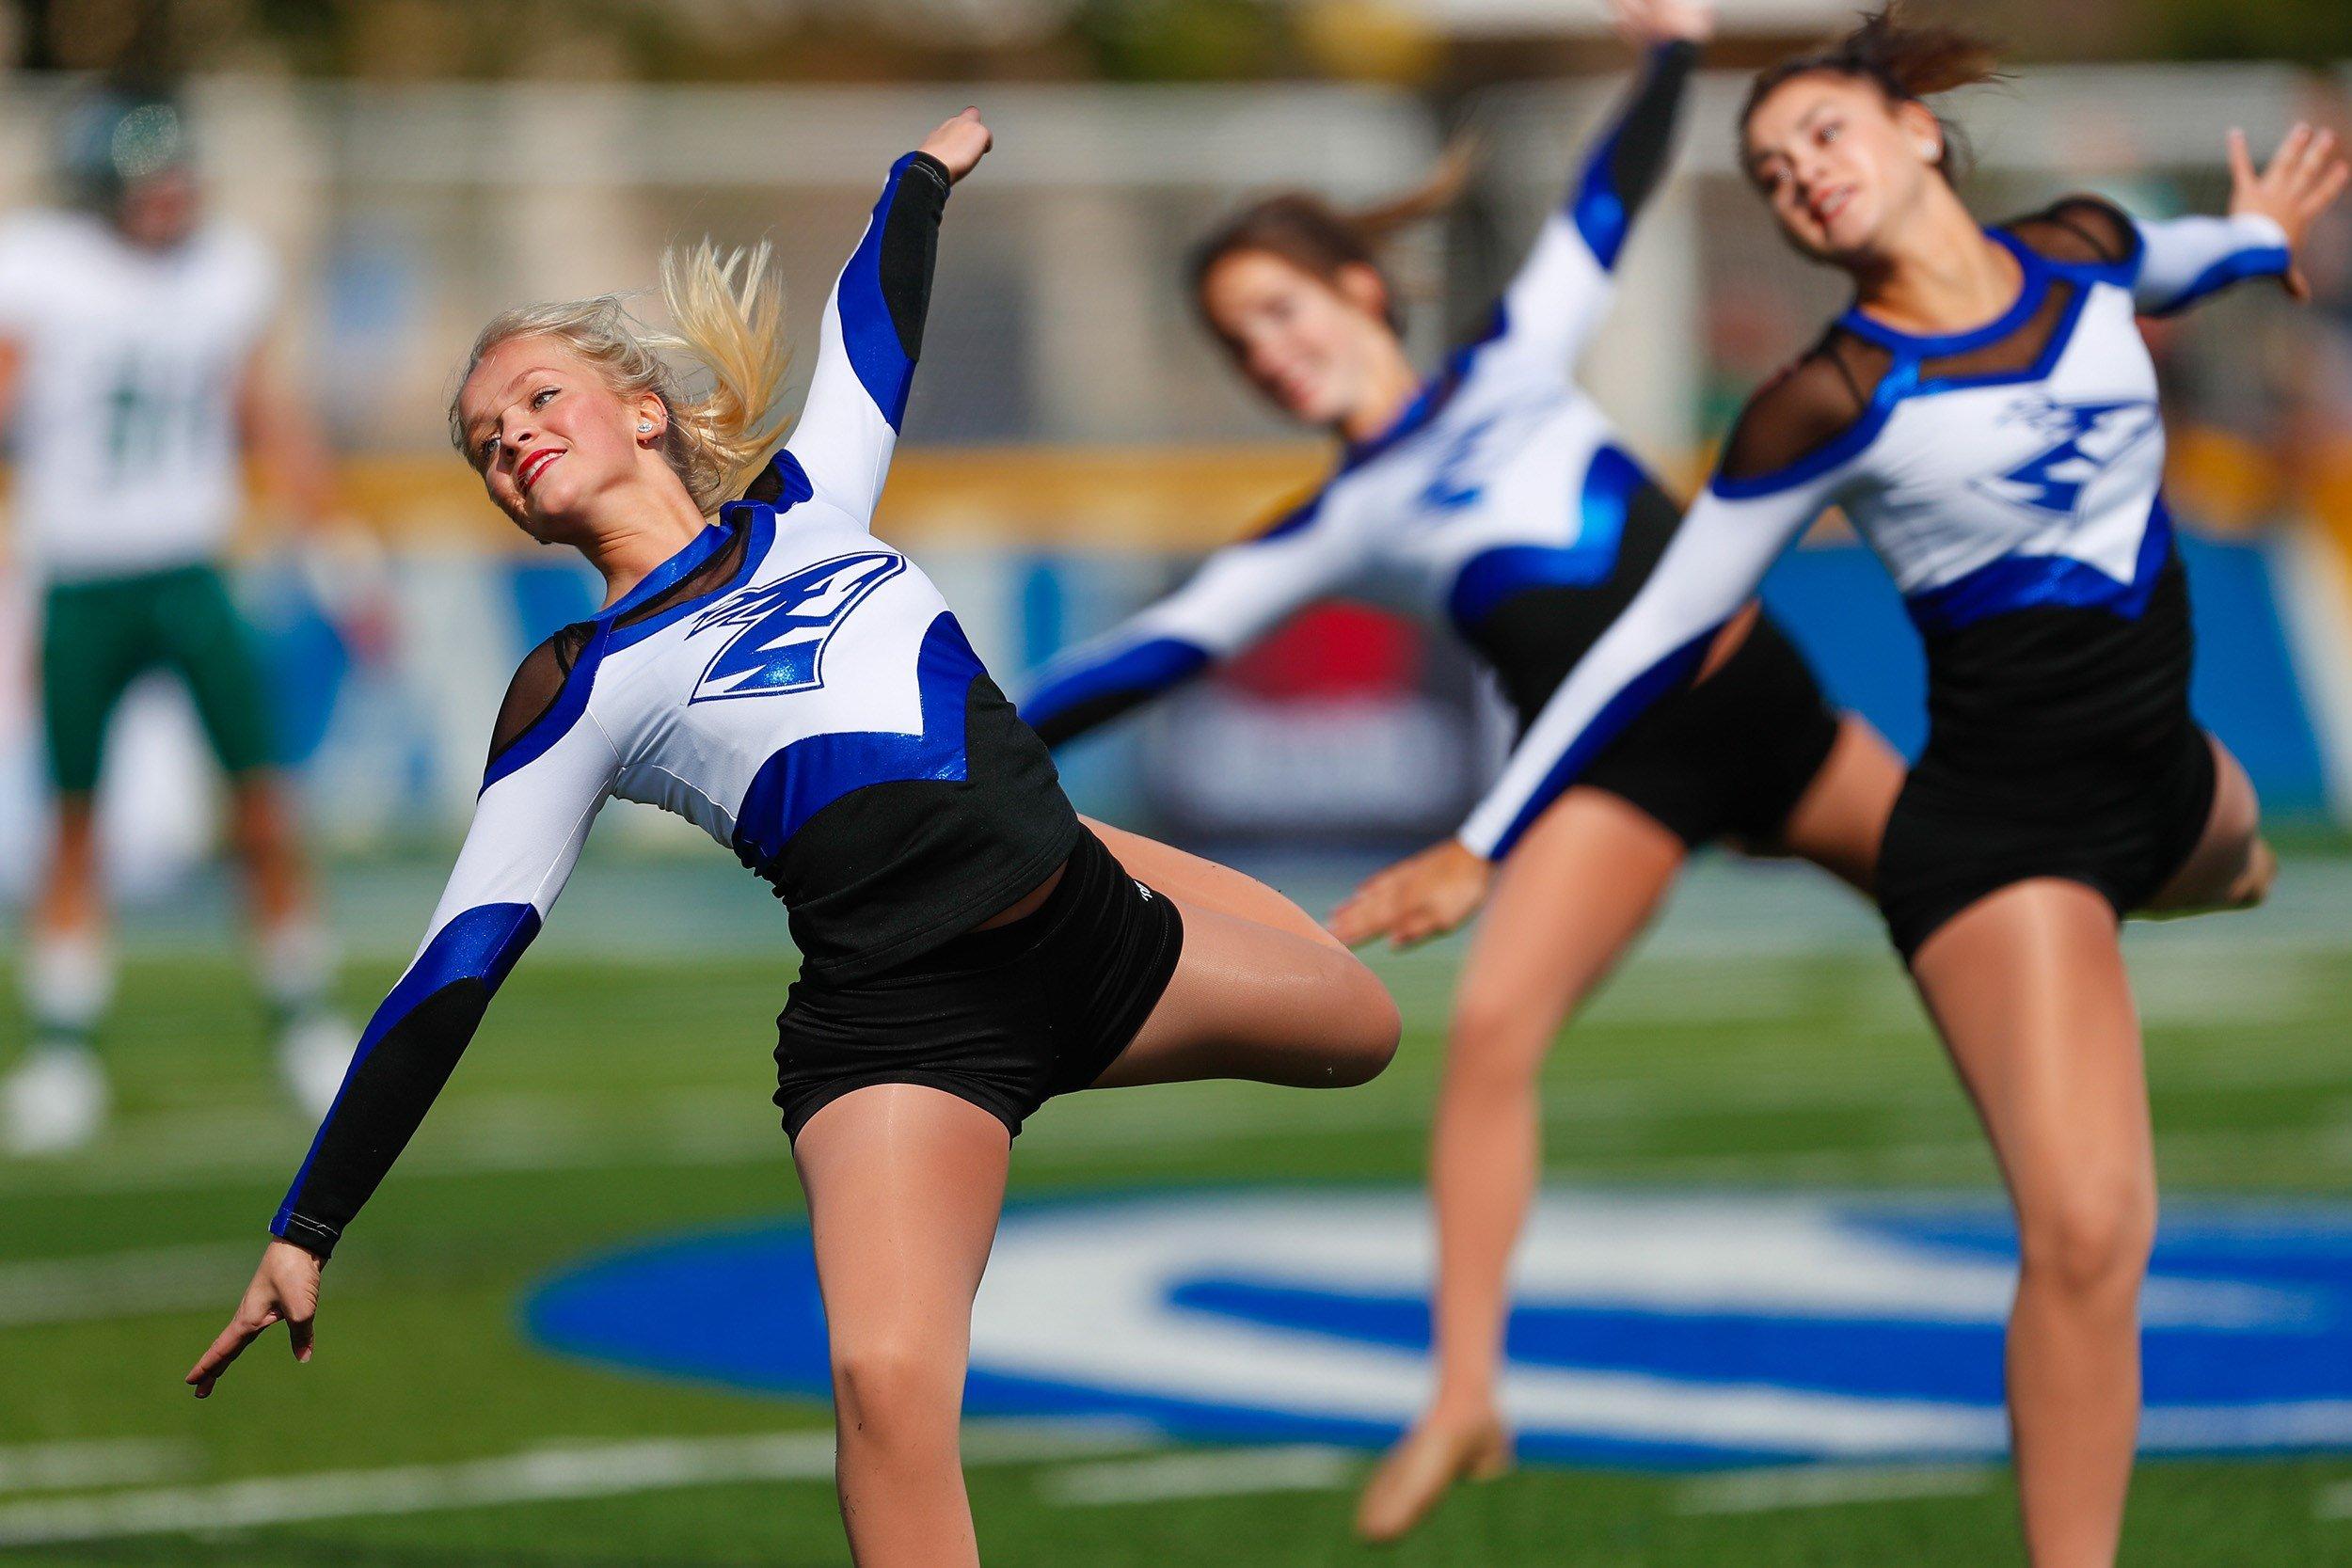 UNK grad earns spot on Denver Broncos cheerleading squad